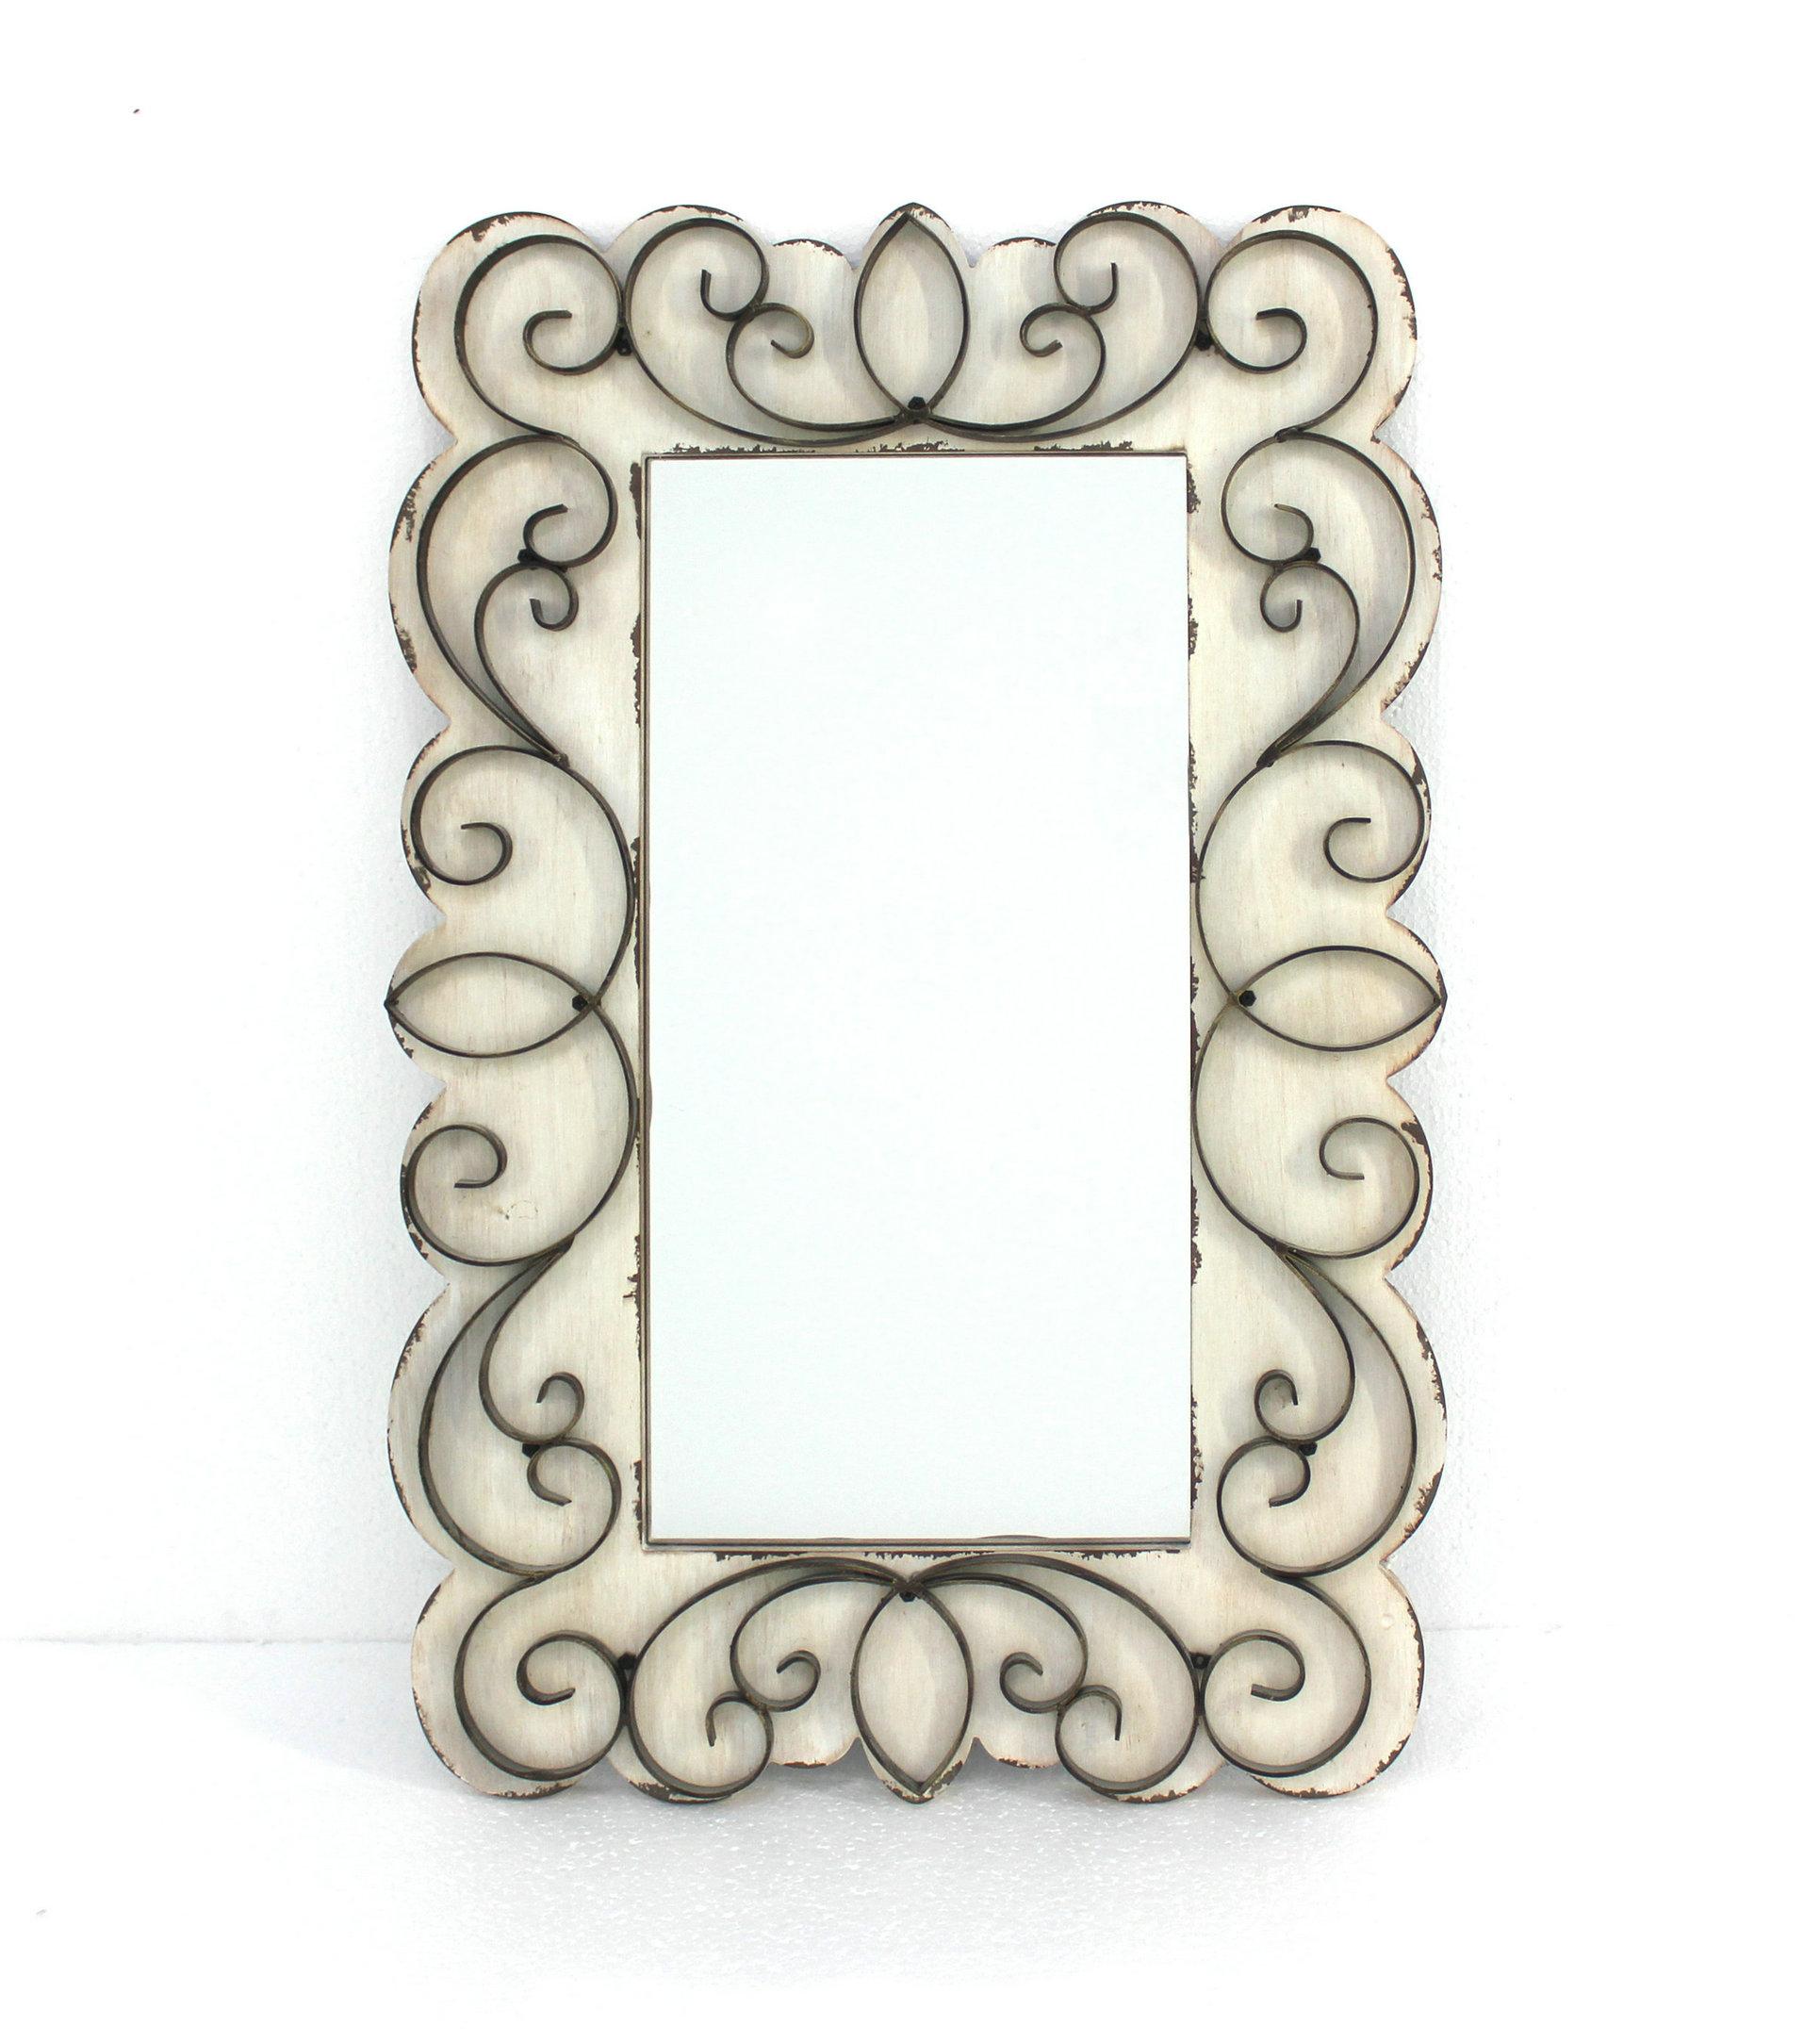 "32.75"" x 21.75"" x 1.25"" White, Vintage Decorative, Wood & Metal - Wall Mirror"